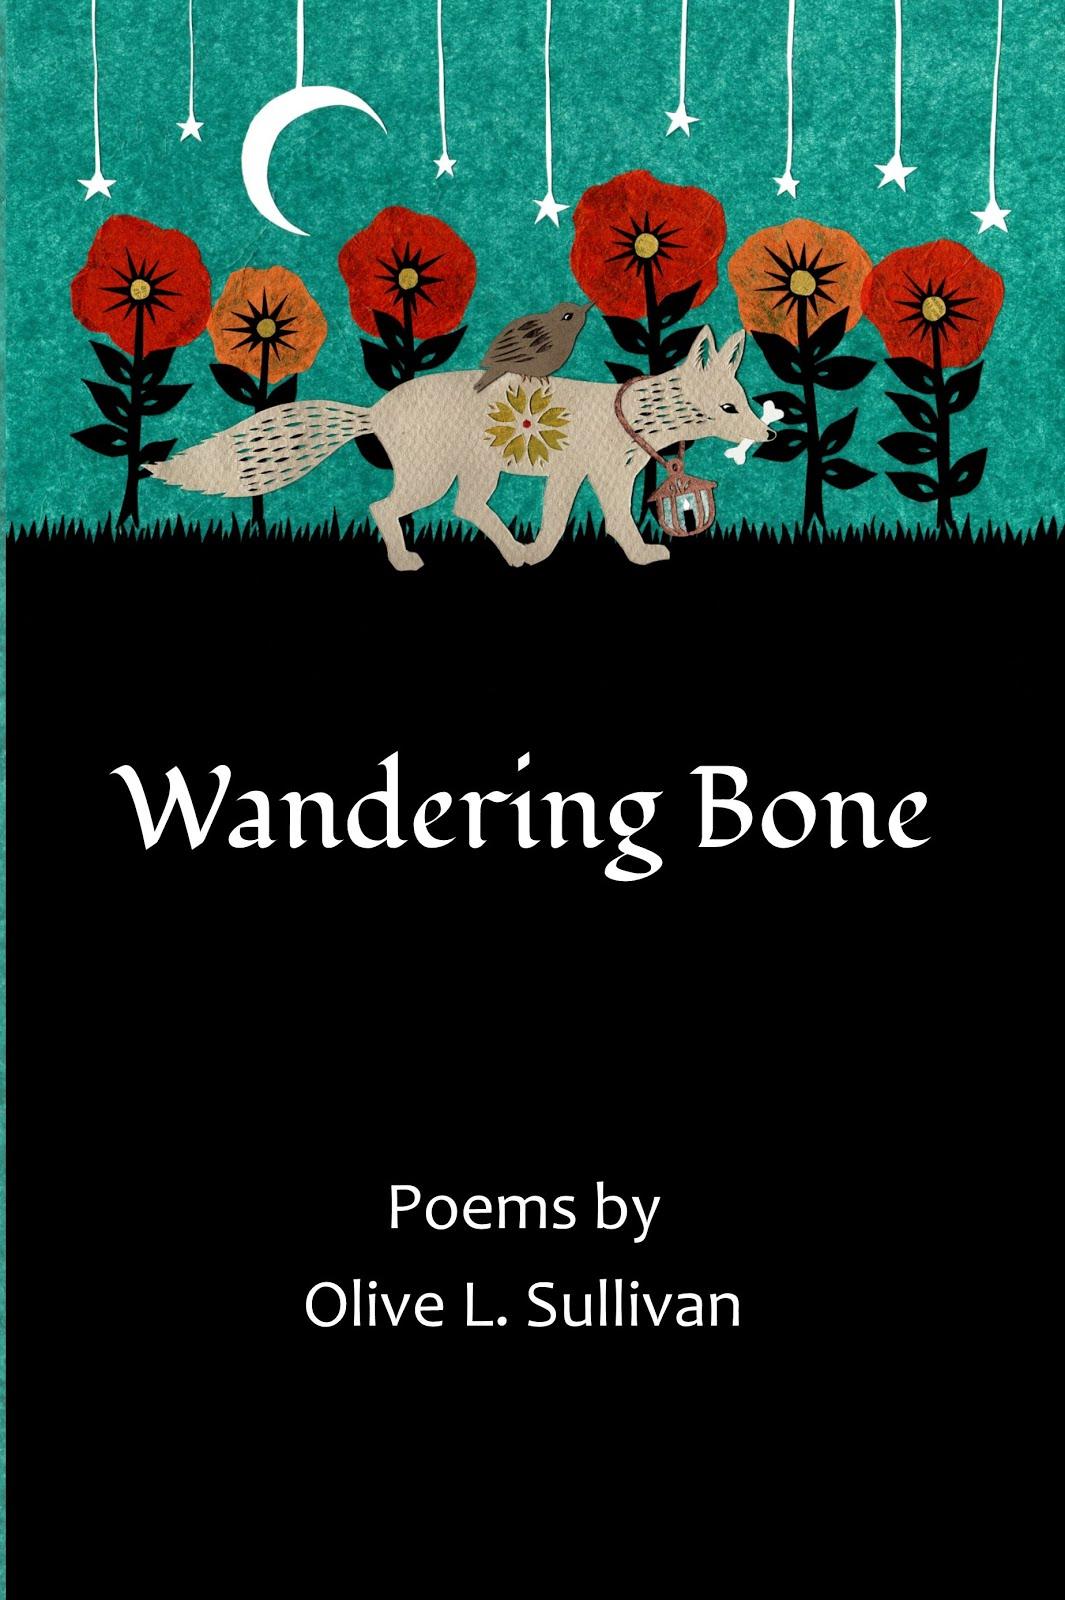 Wandering Bone